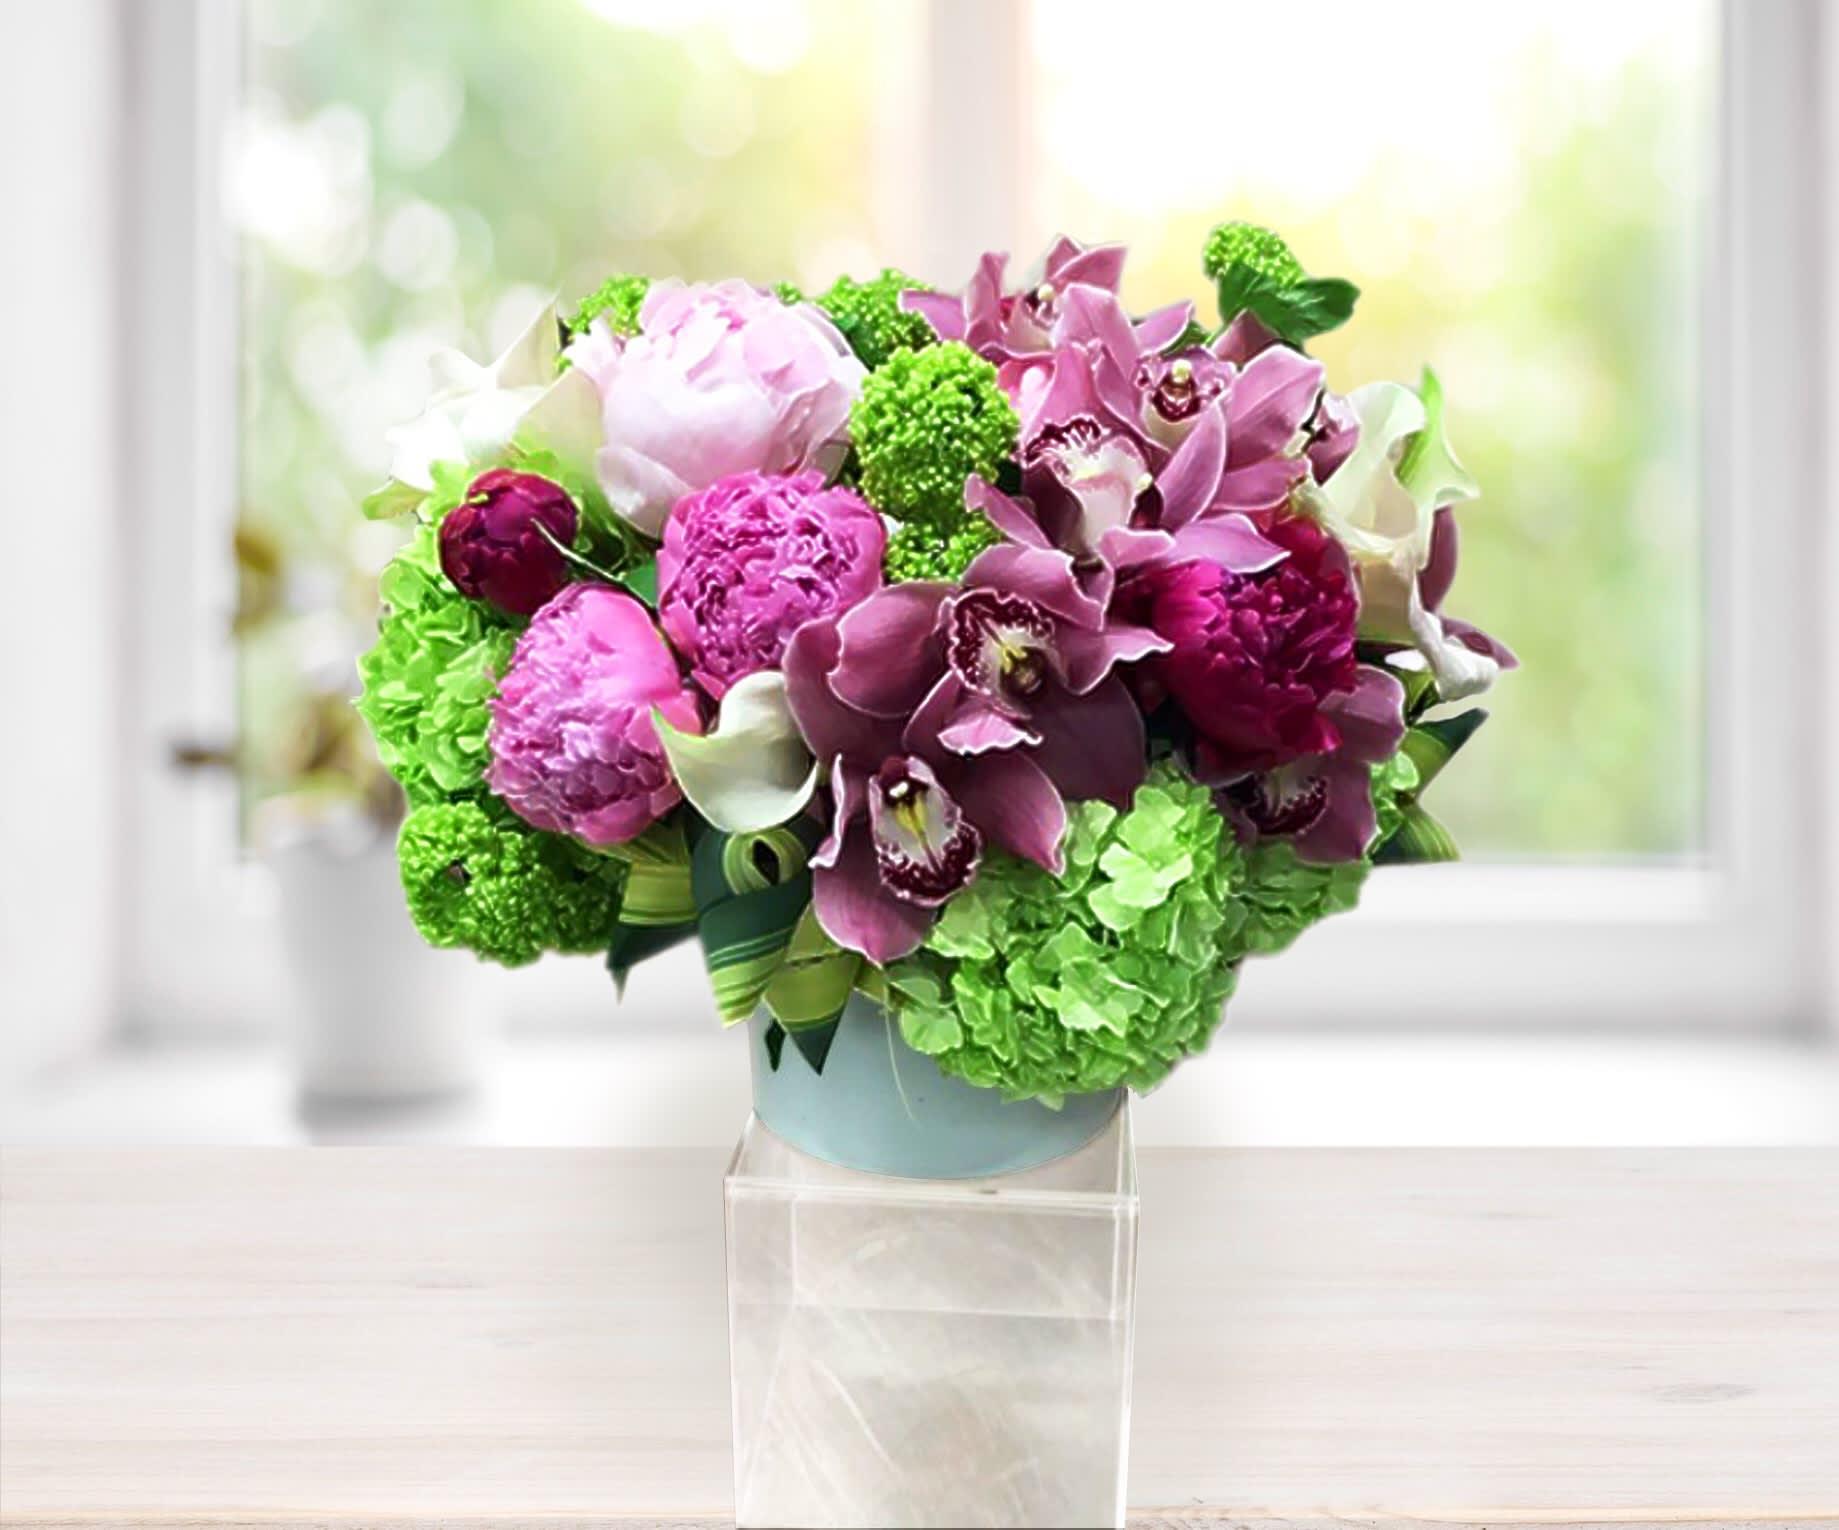 Bountiful Bouquet - ⚜️LeFleur Vase in